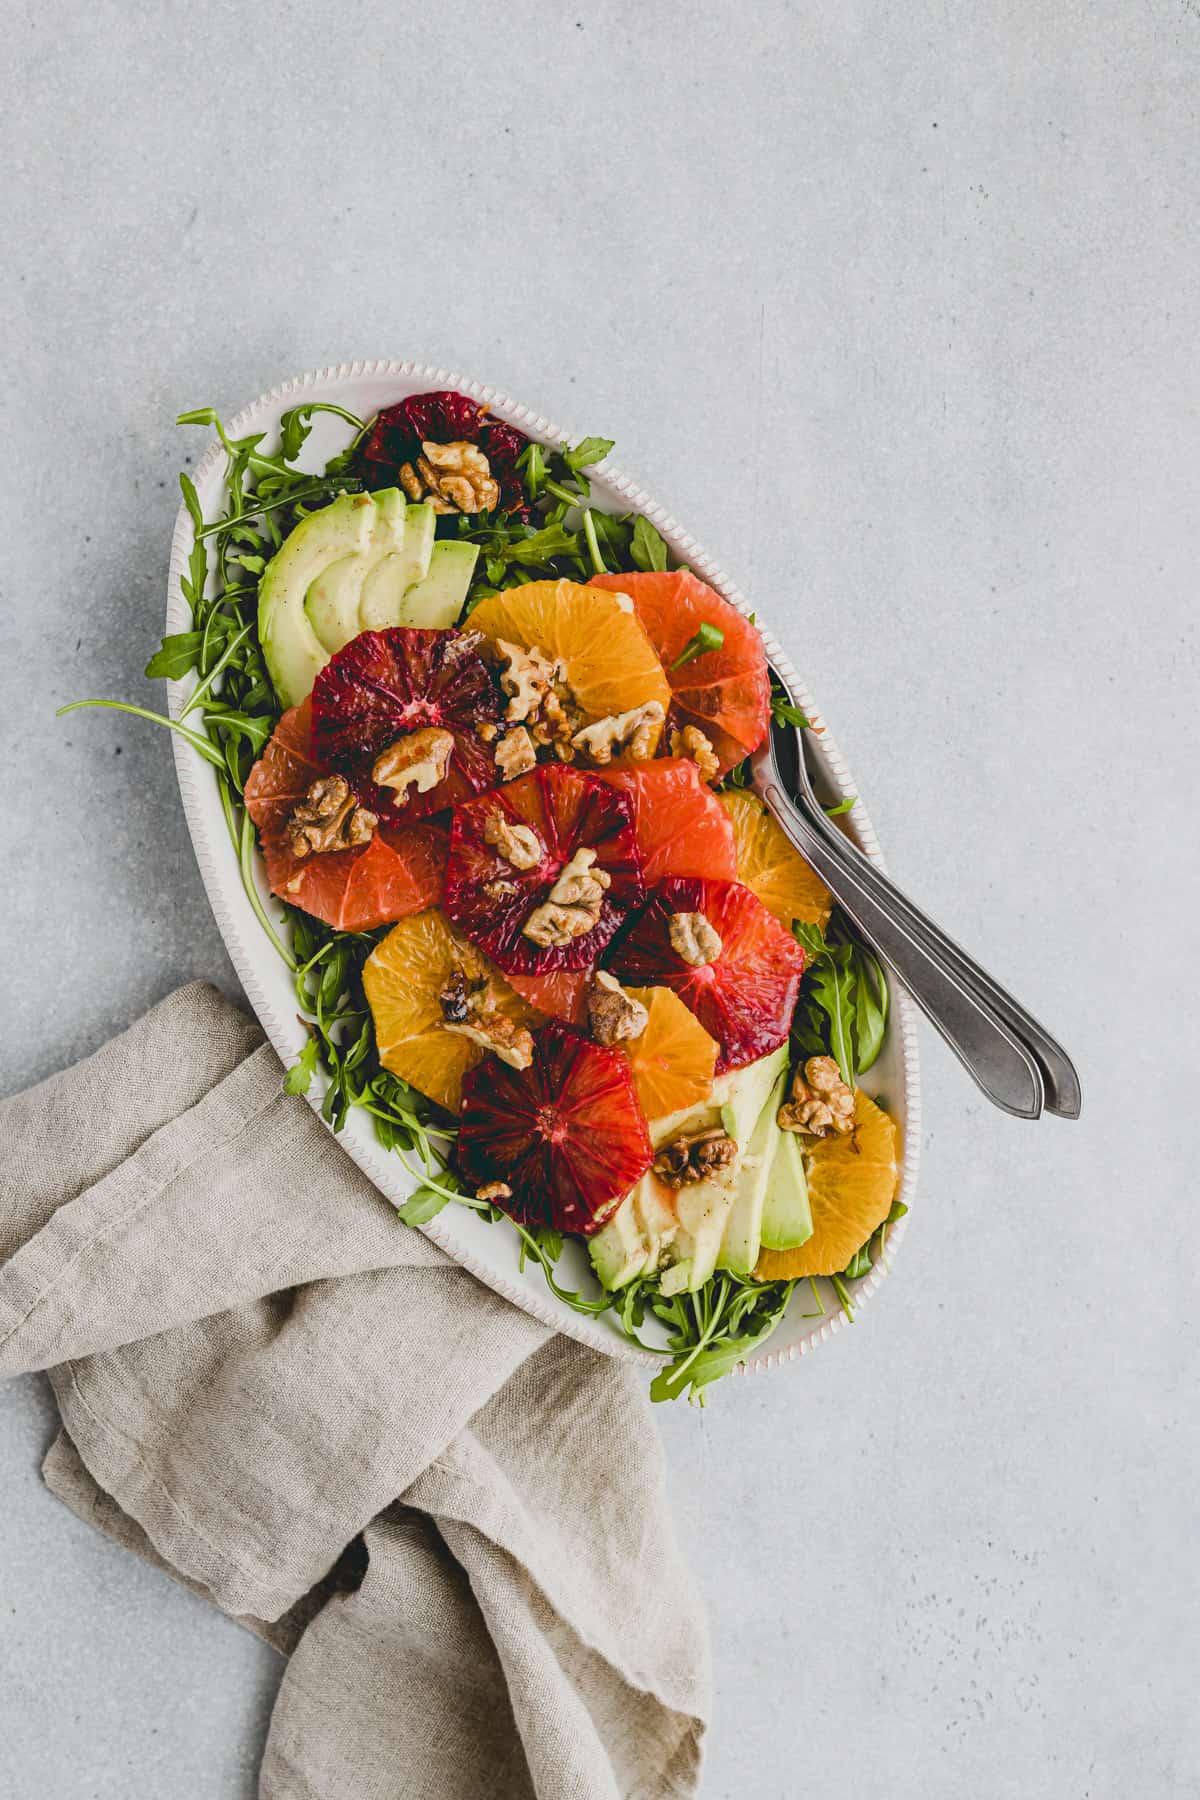 arugula avocado salad with orange and grapefruit